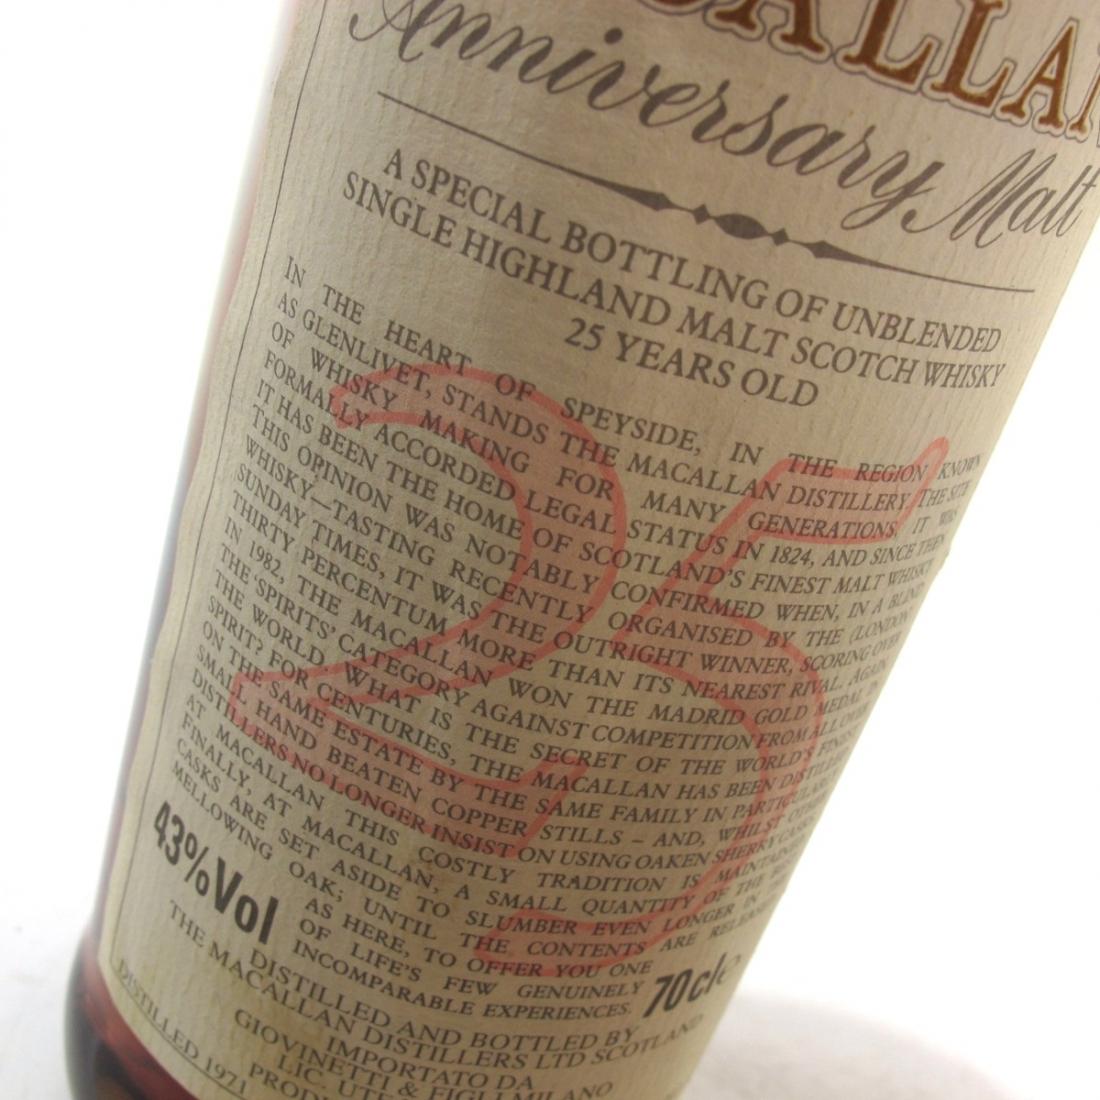 Macallan 1971 Anniversary Malt 25 Year Old / Giovinetti Import